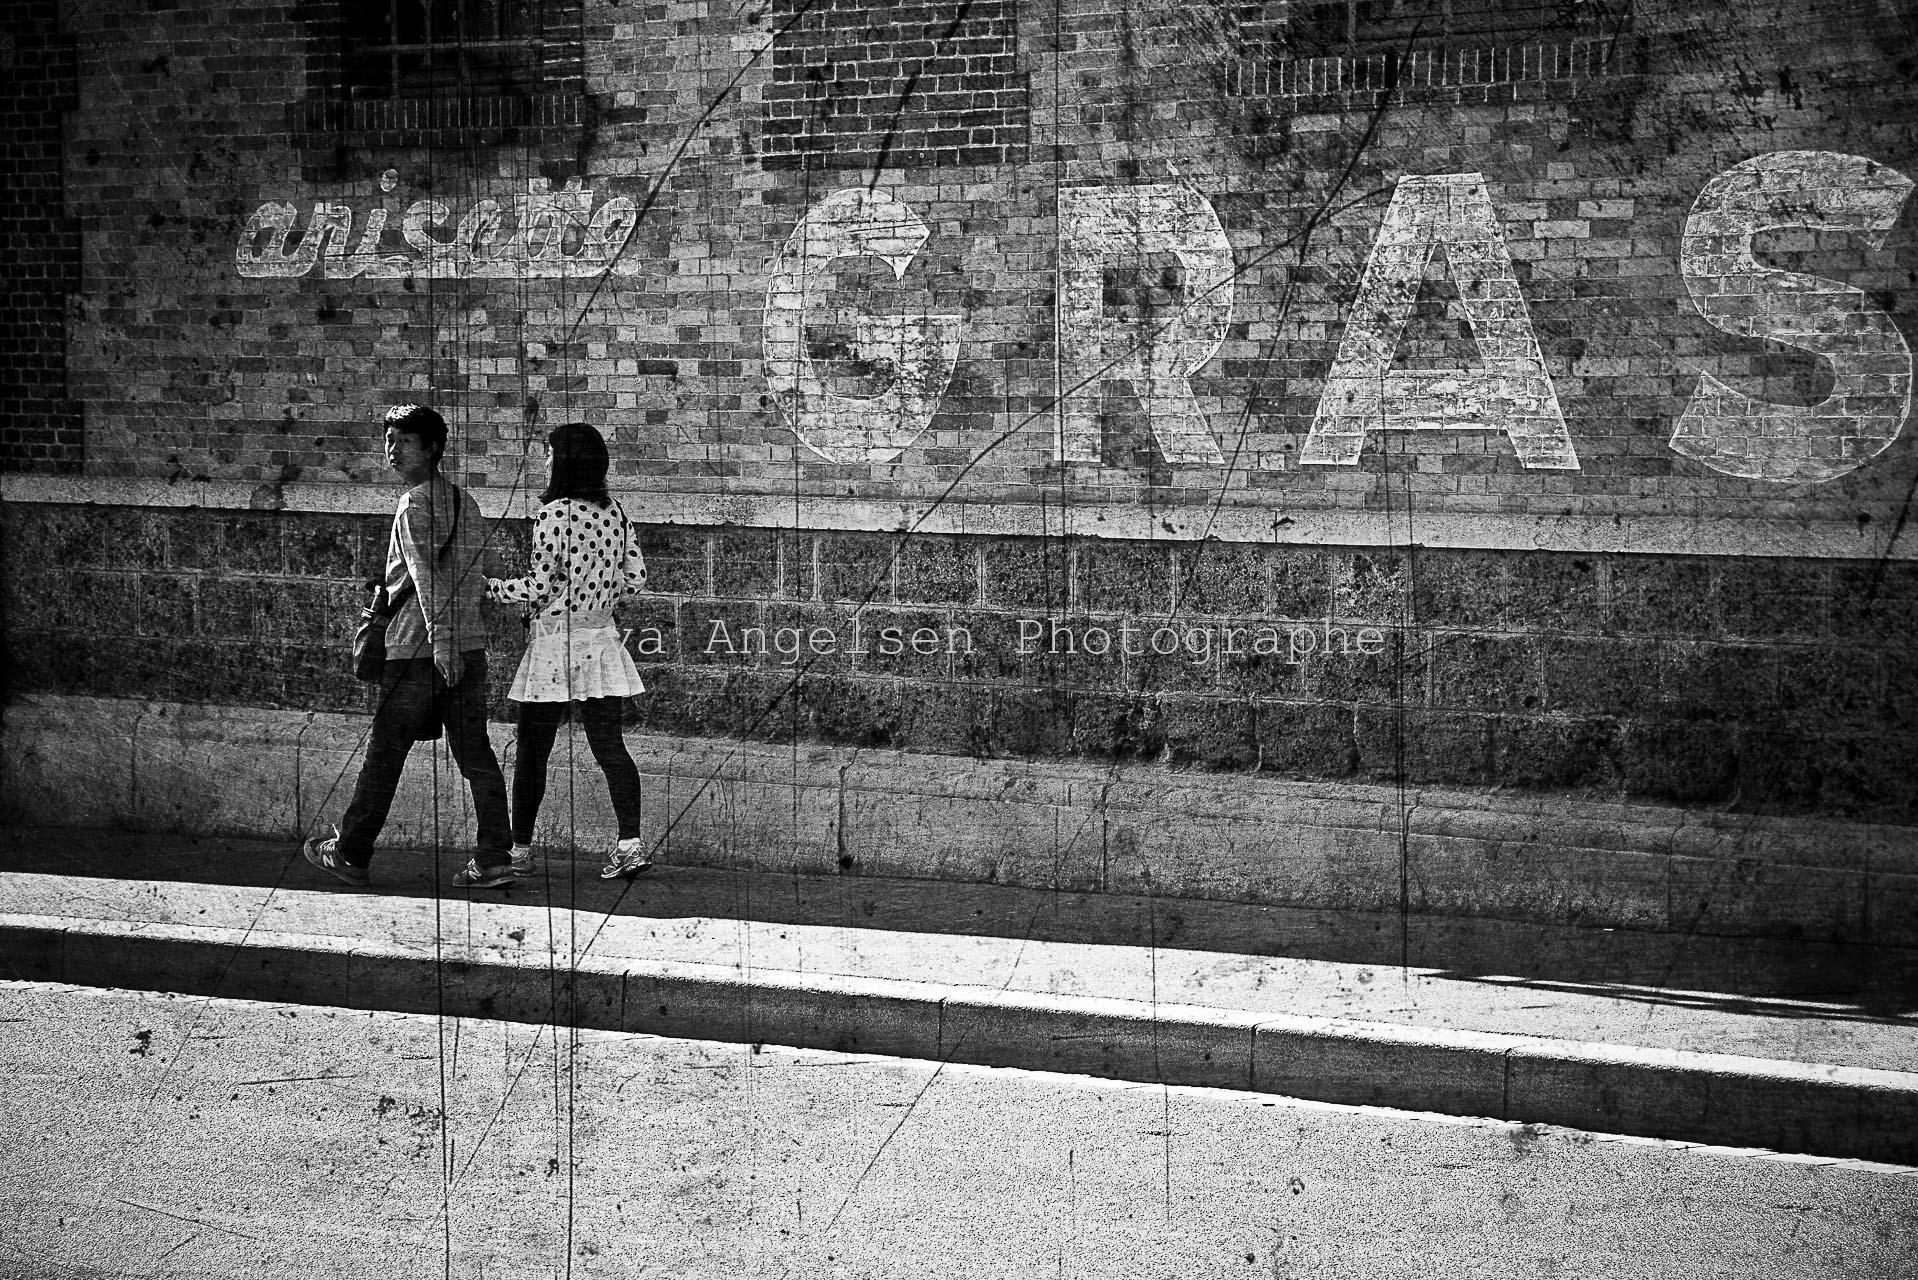 Photographe-streetphoto-maya-angelsen-Anisette